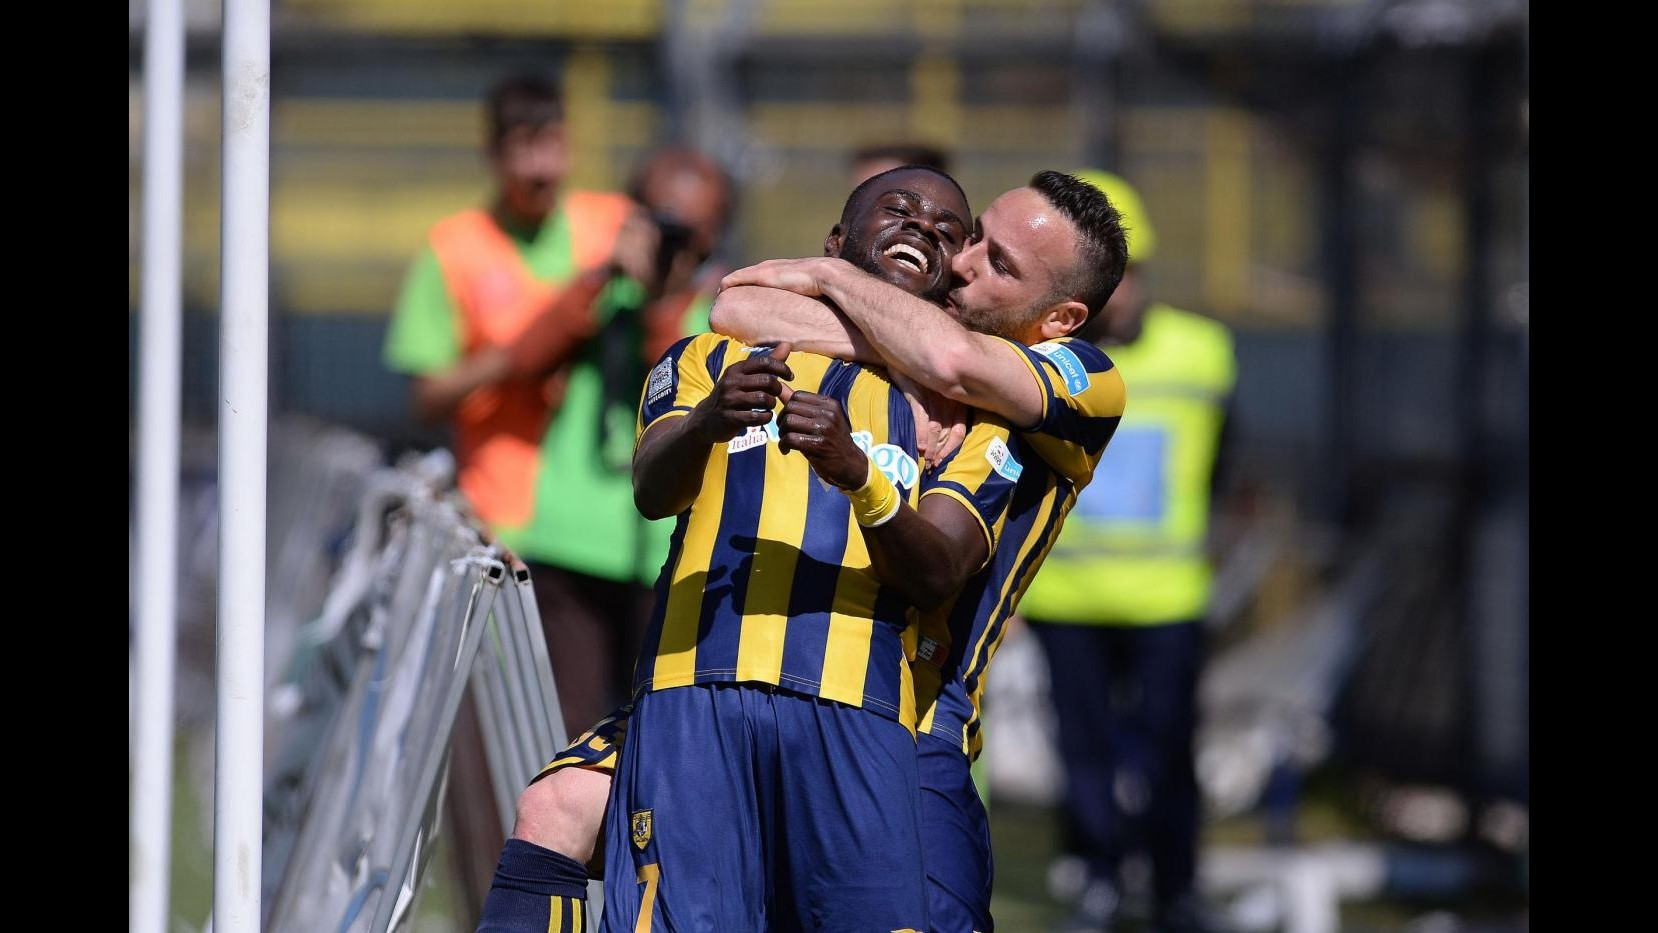 FOTO Lega Pro, Juve Stabia-Fidelis Andria 2-1